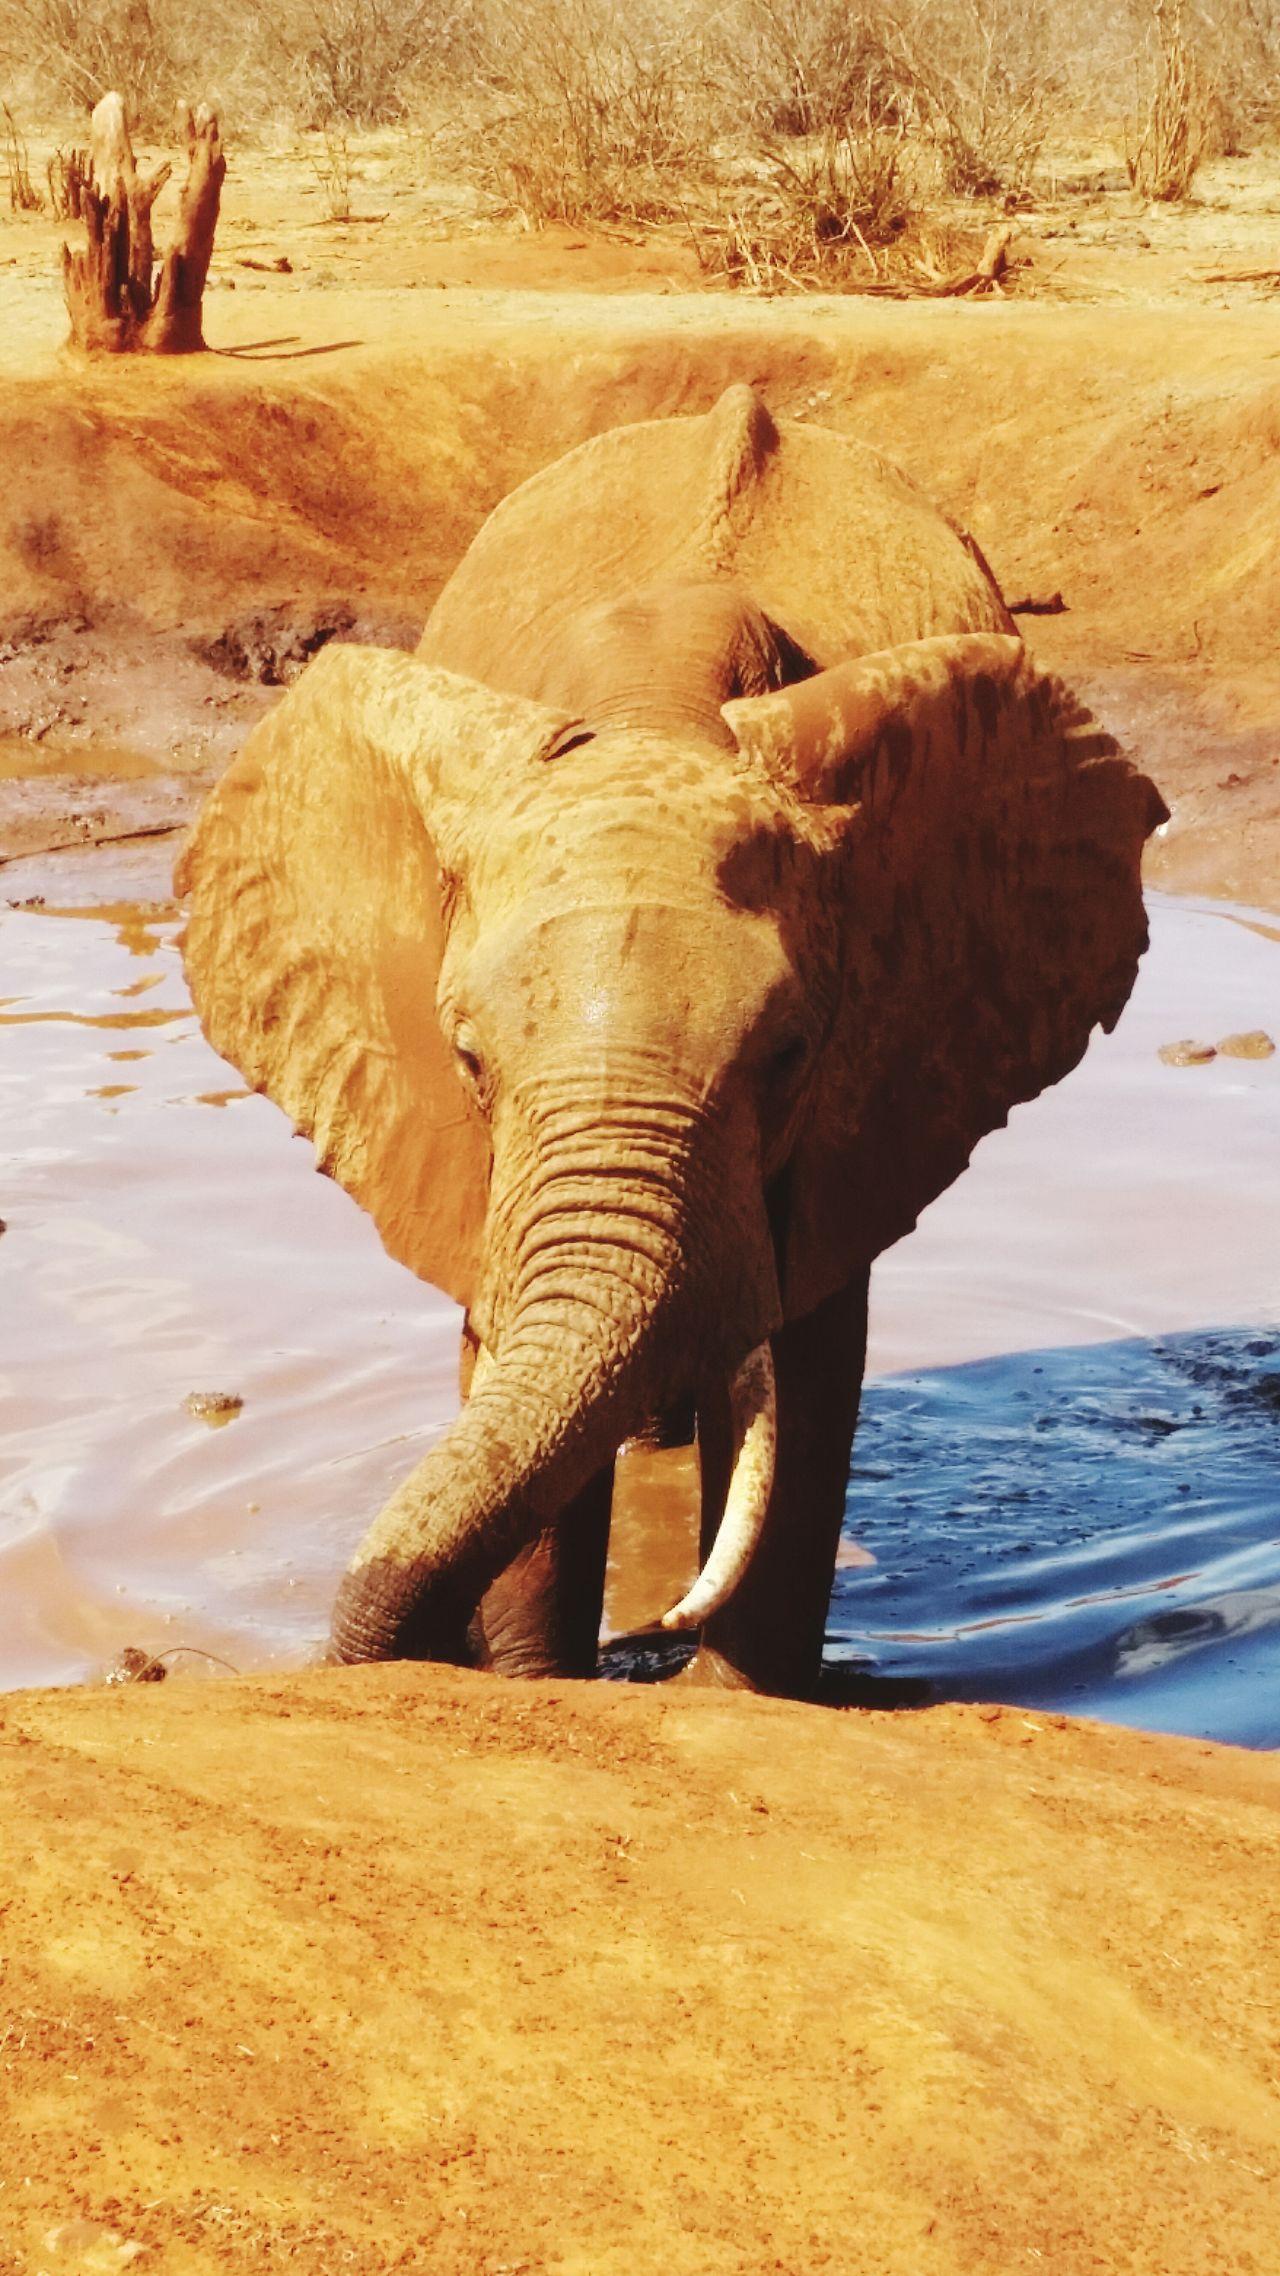 Kenyan wildlife @ Tsavo East First Eyeem Photo Elephant Wildlife Kenya Water Hole Africa Safari Animals National Park Nationalpark Tsavo Tour Adventure